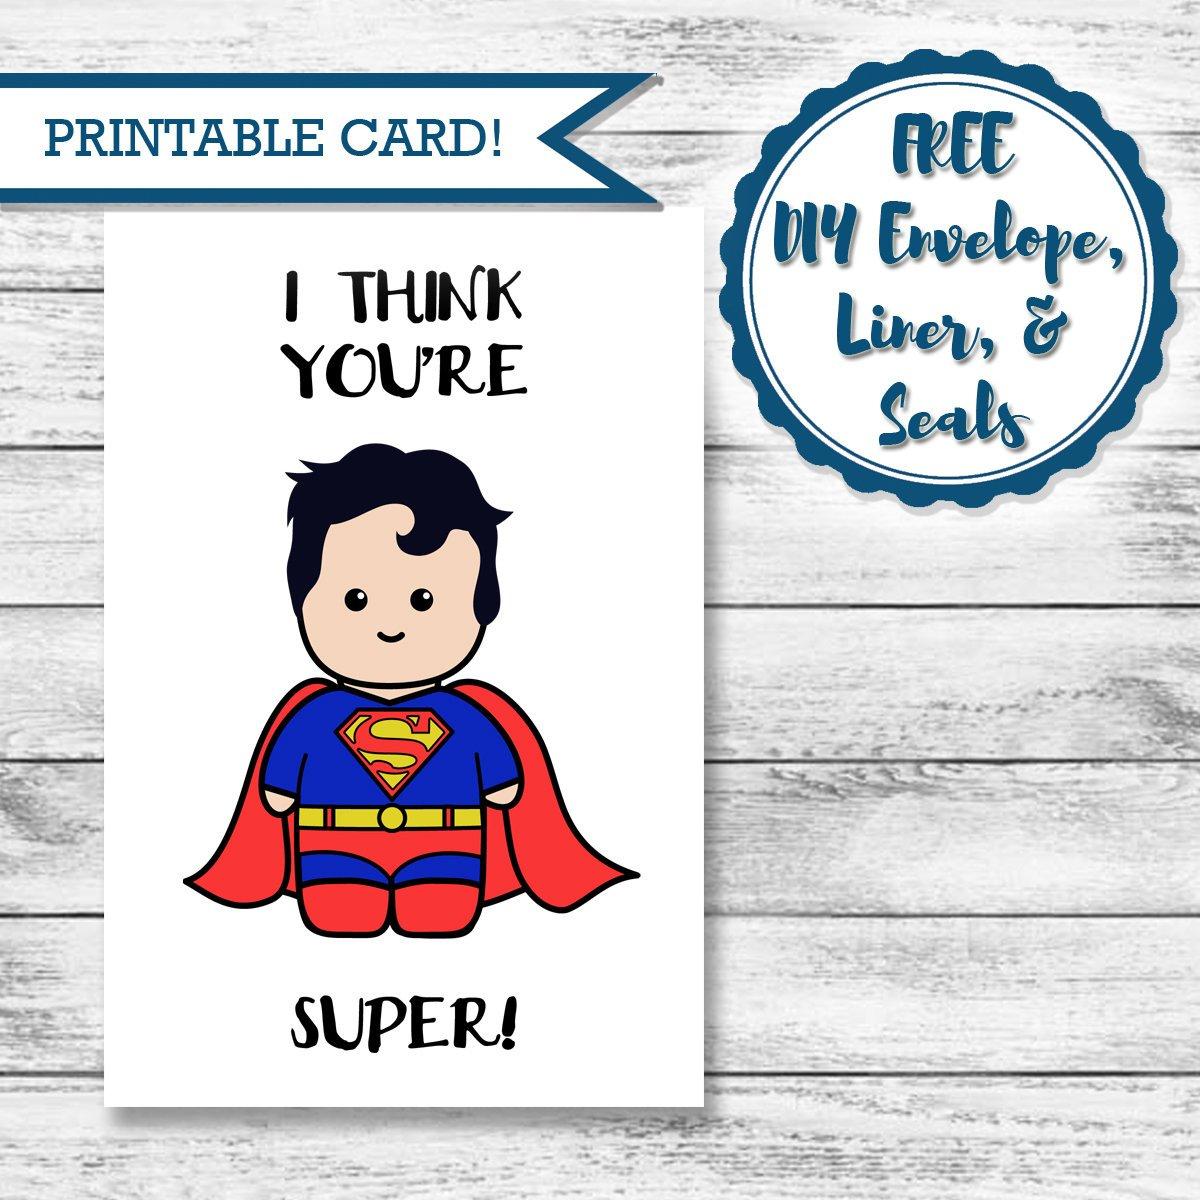 Printable Super Hero Card Superman Valentine's Day   Etsy - Free Printable Superman Valentine Cards